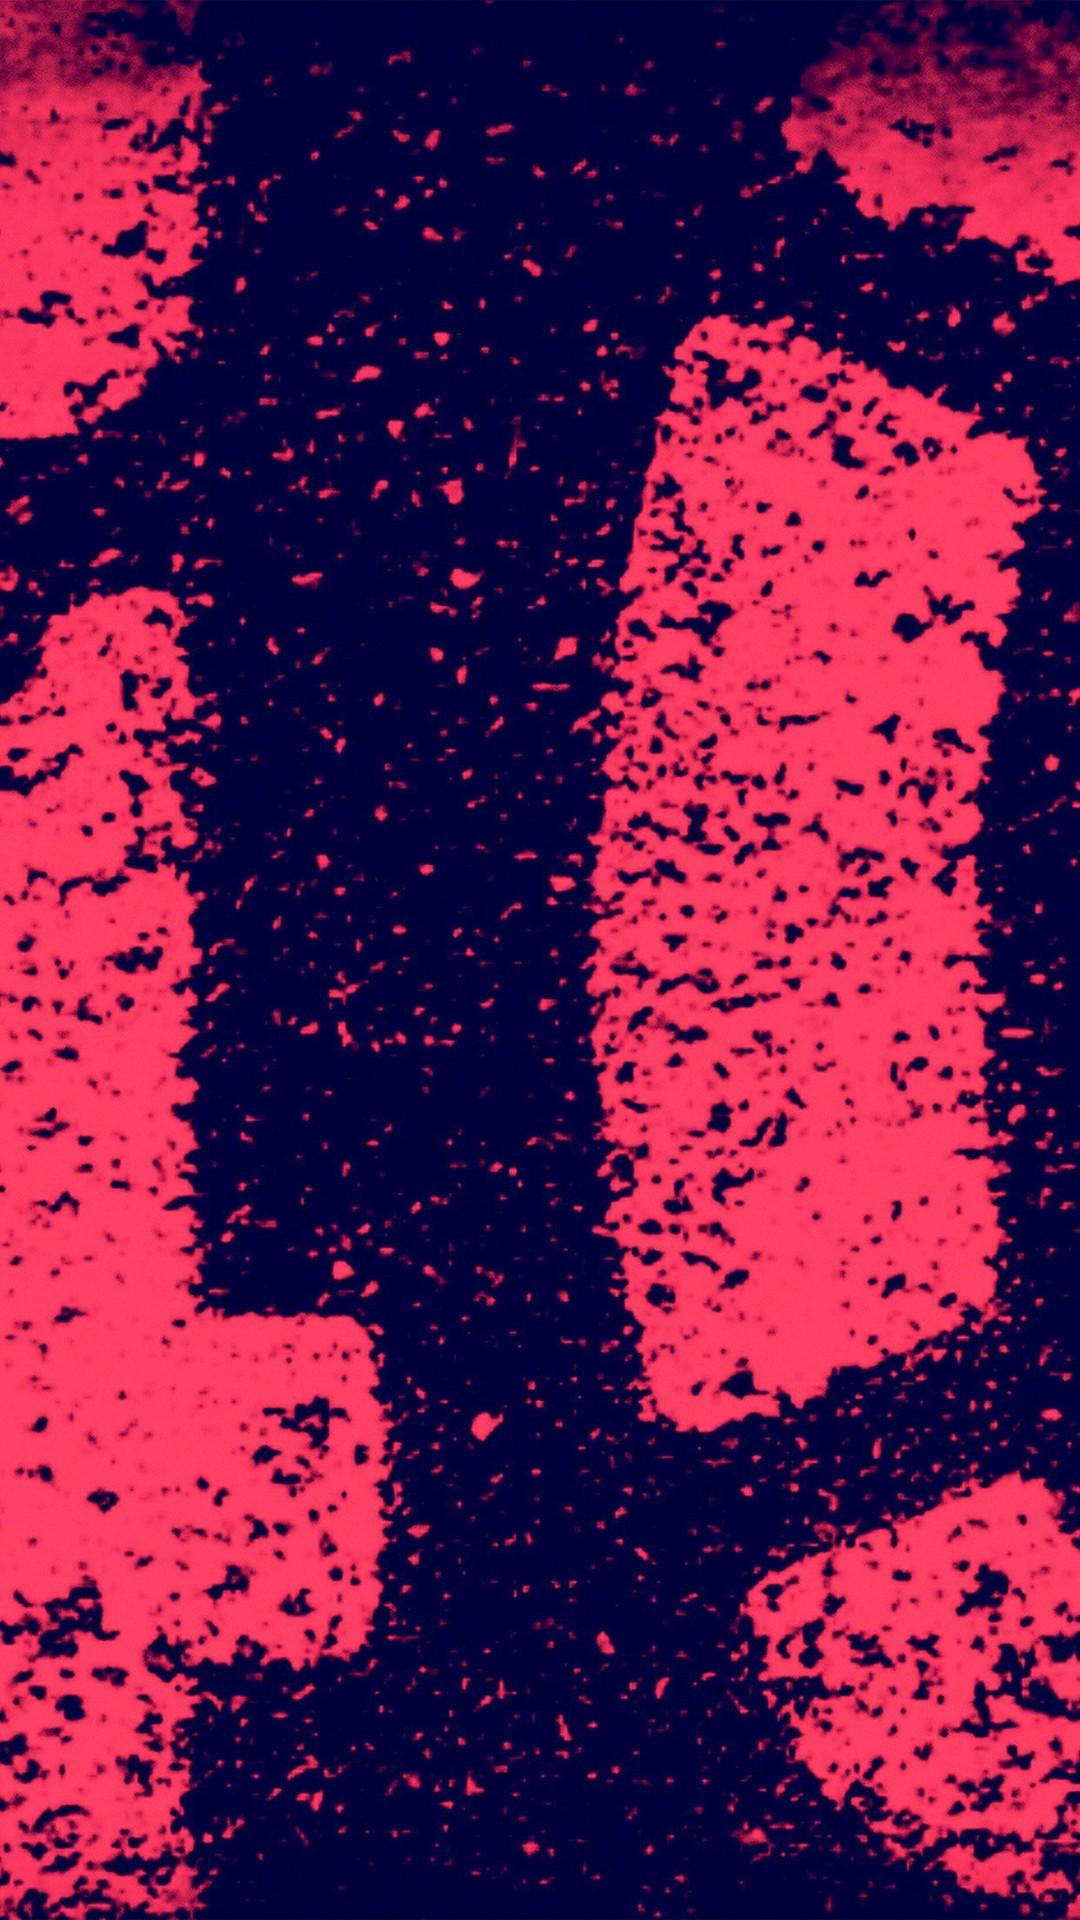 Red Art Paint Grunge Illustration iPhone 6 wallpaper